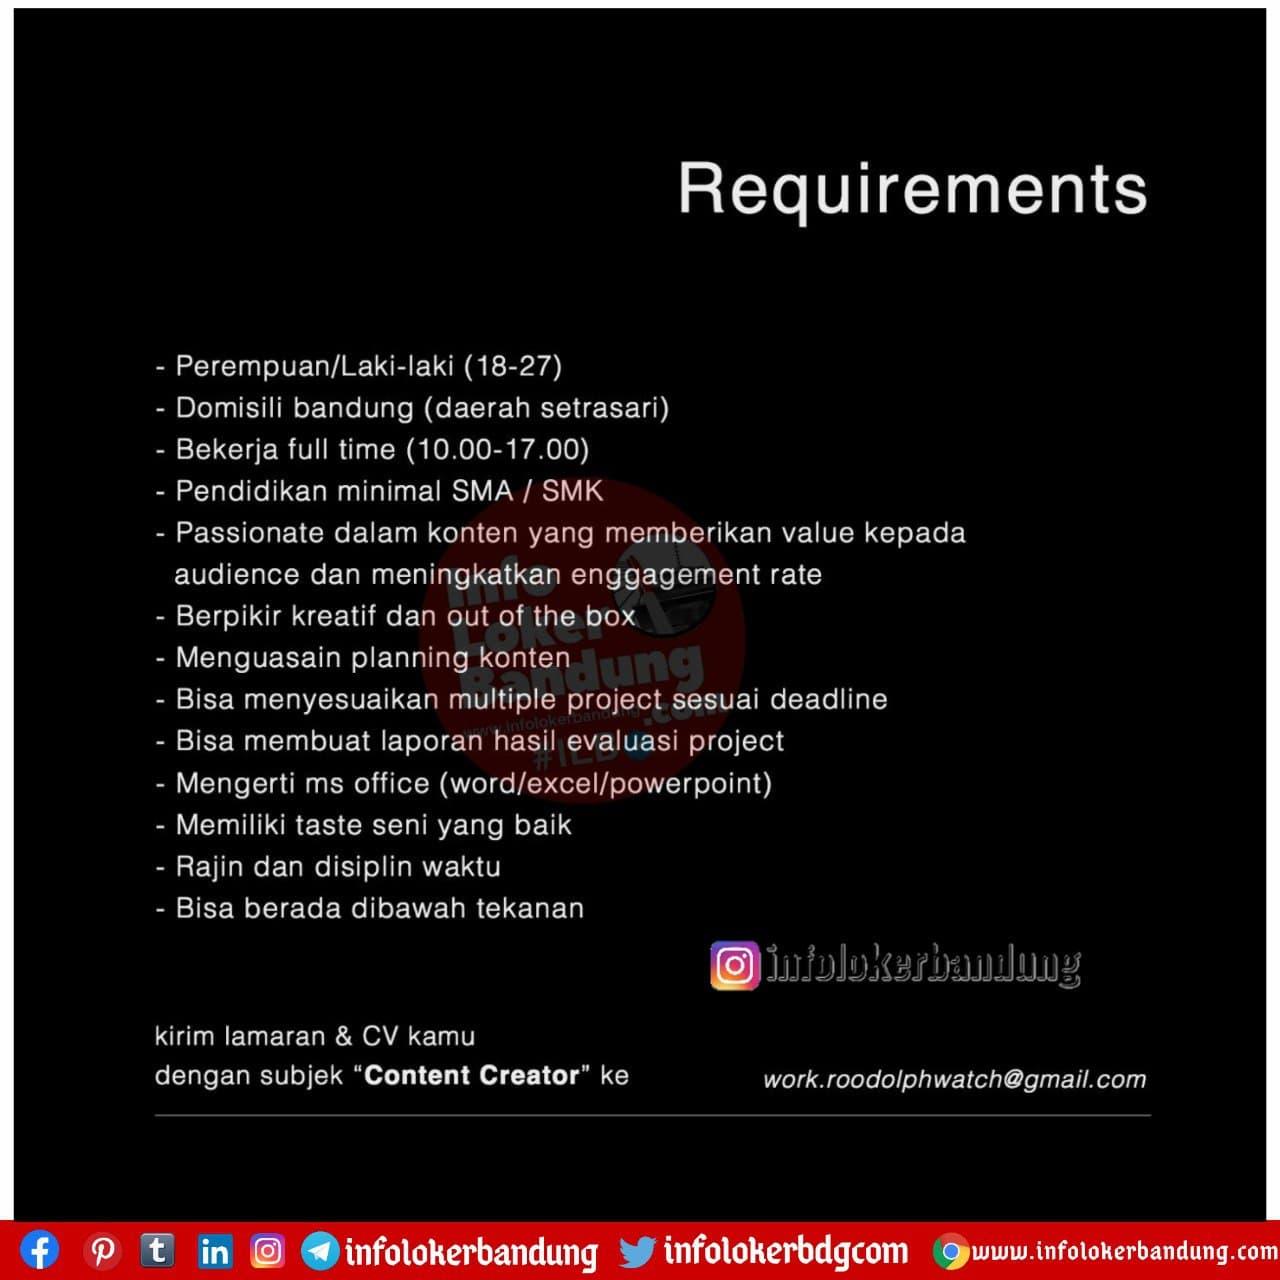 Lowongan Kerja Roddolph Watch Bandung November 2020